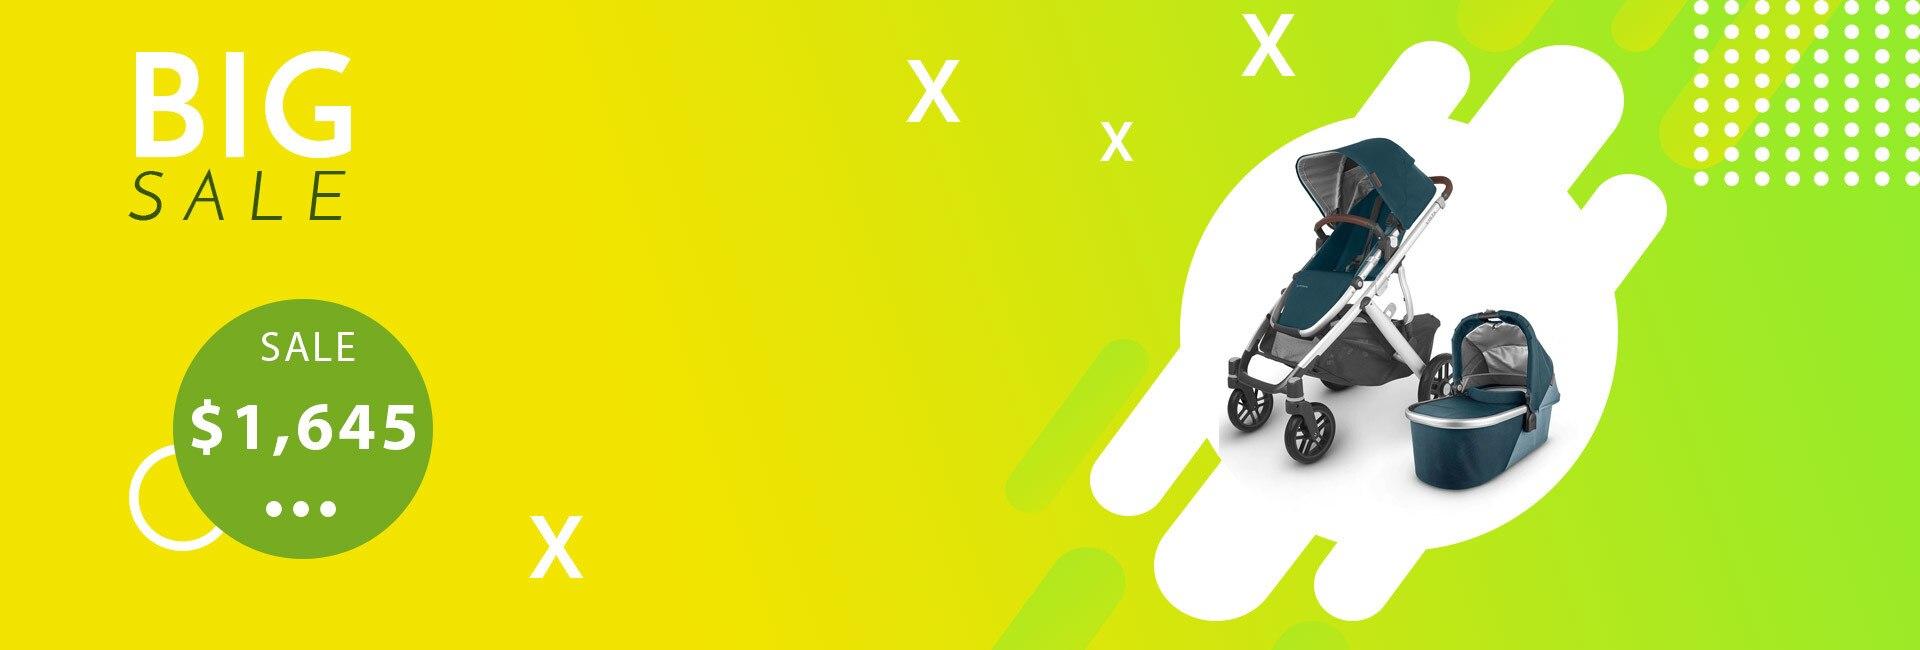 UppaBaby Vista Stroller Package Deal